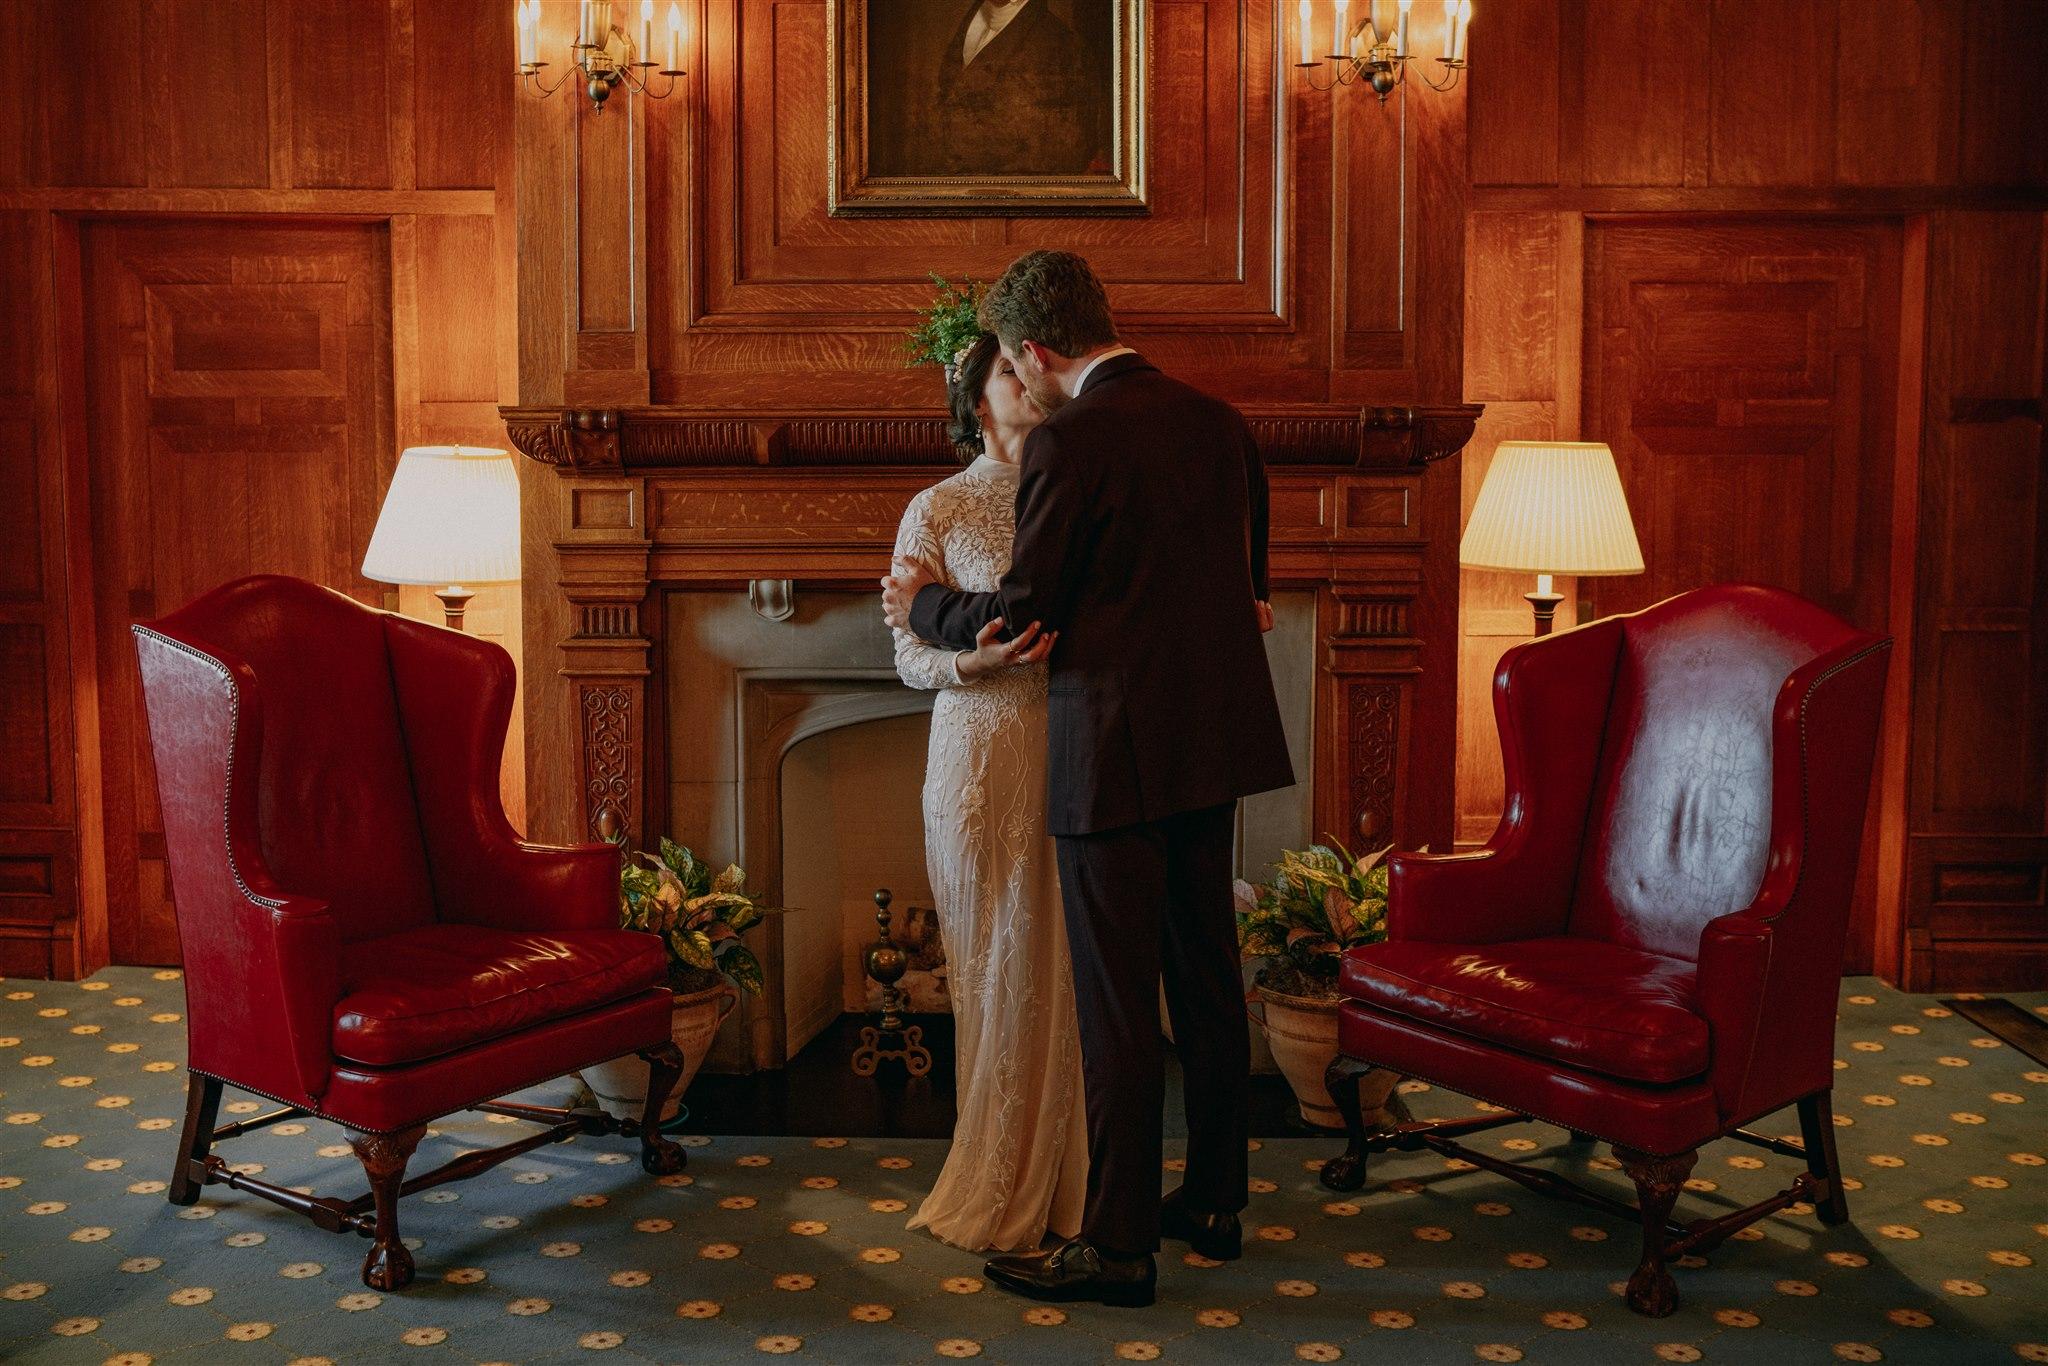 Chellise_Michael_Photography_Hudson_Valley_Wedding_Photographer_Otesaga_Hotel-4014.jpg